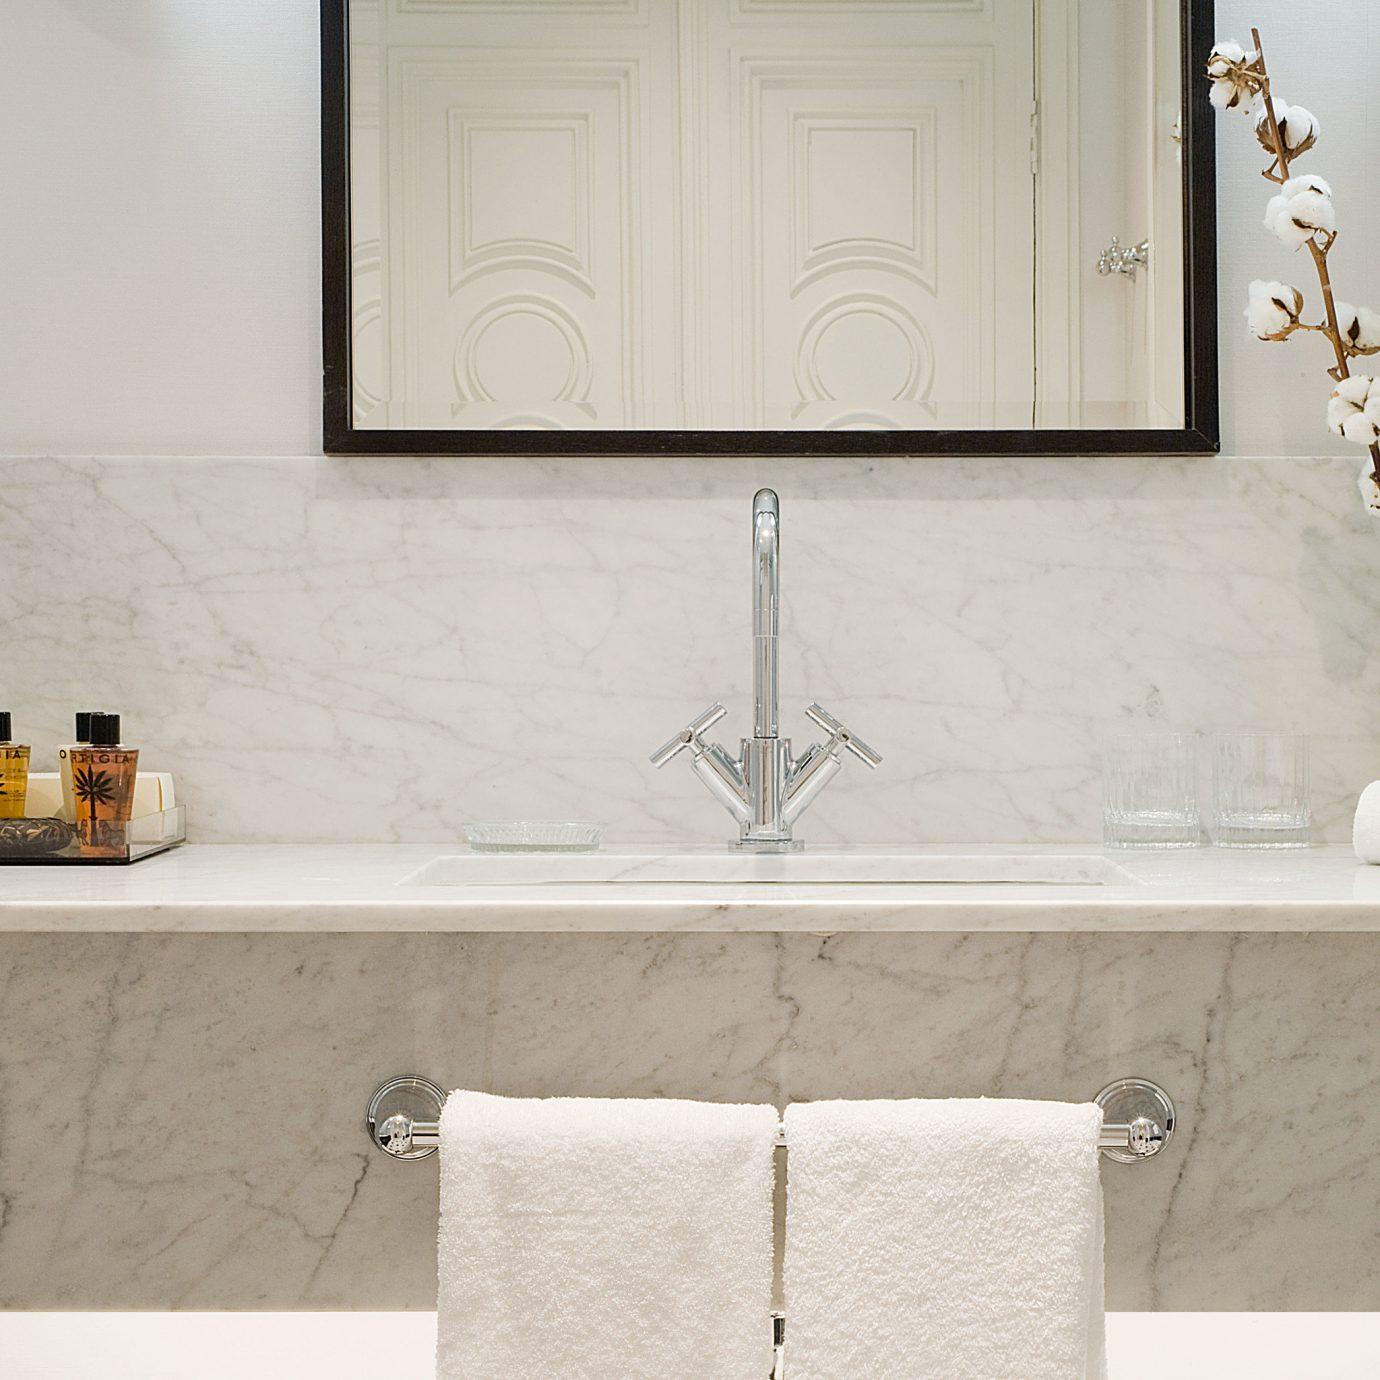 bathroom sink tile plumbing fixture countertop flooring bathtub home bathroom cabinet toilet